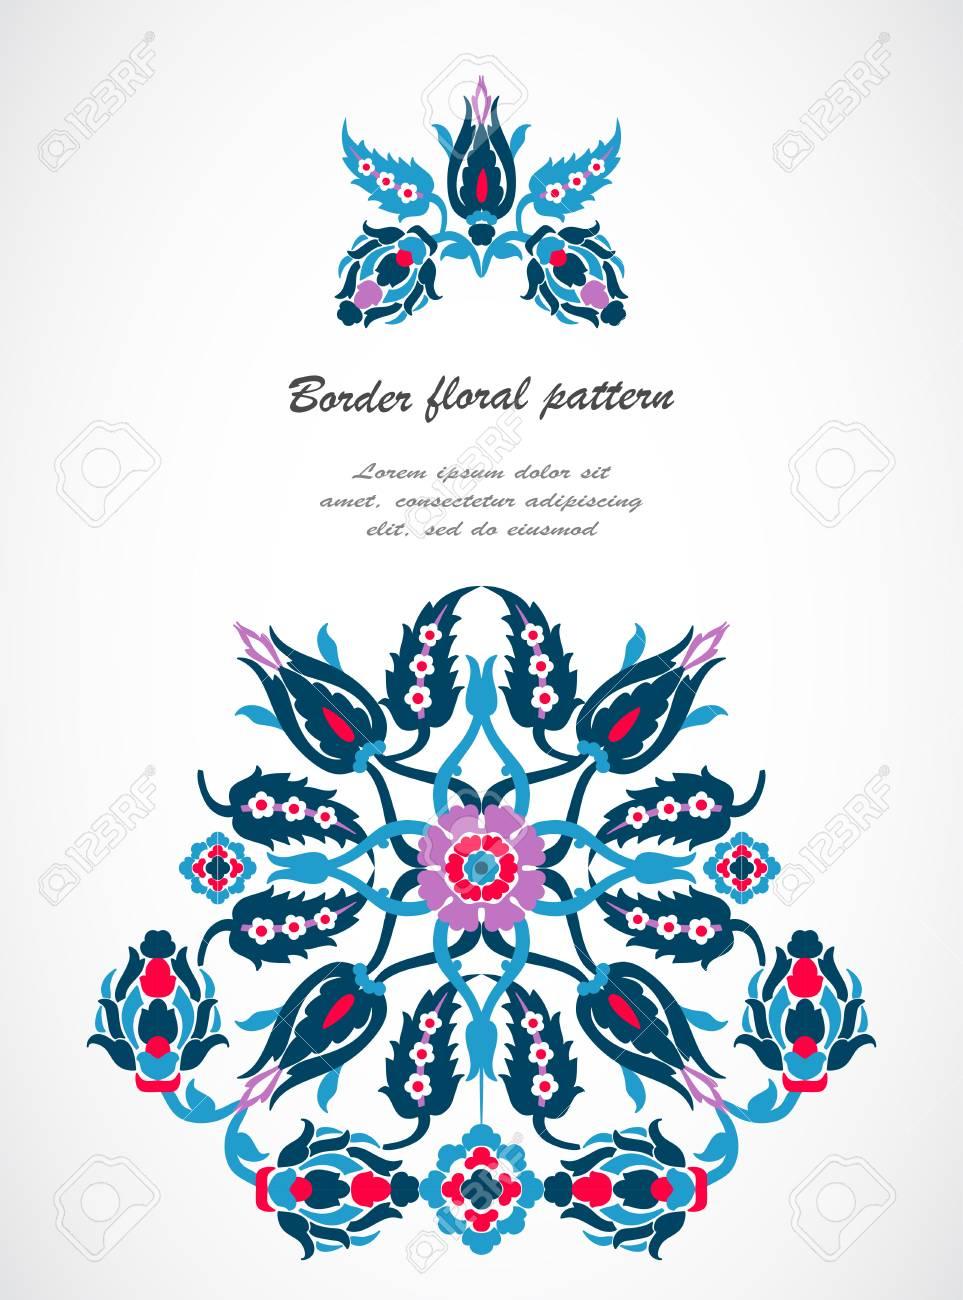 46bf86cfd0b7 Arabesque vintage ornate border for design template vector. Eastern style  pattern. Elegant floral decoration